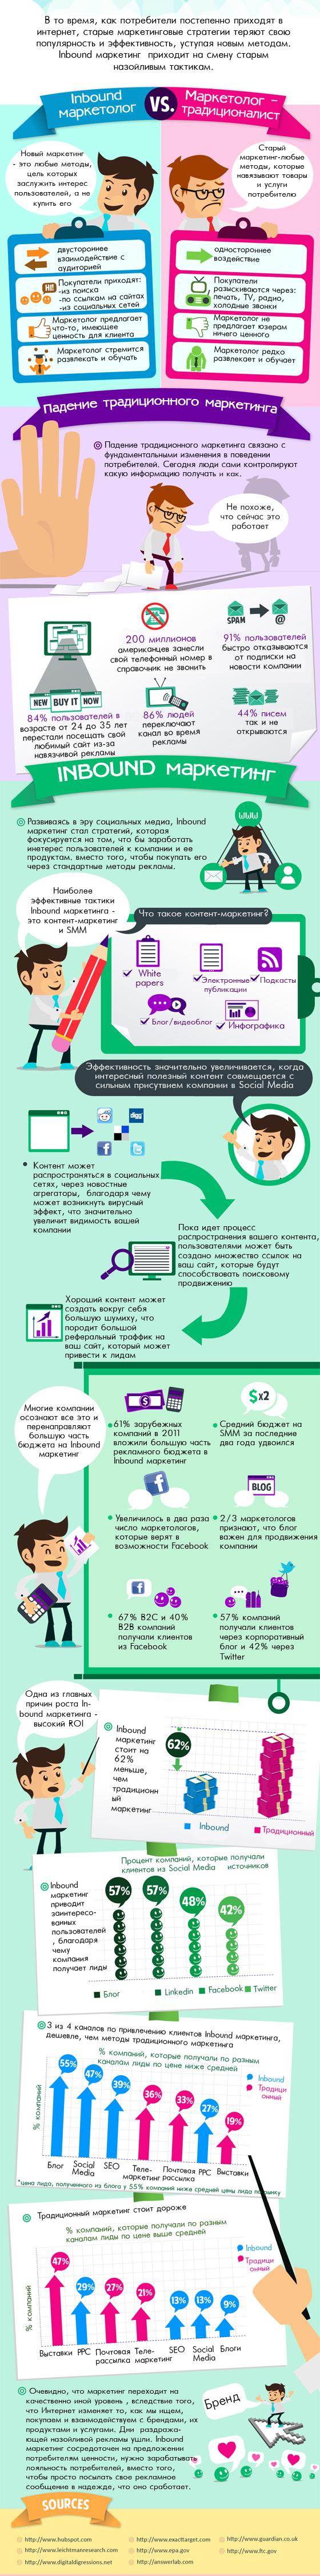 Inbound маркетинг. Инфографика